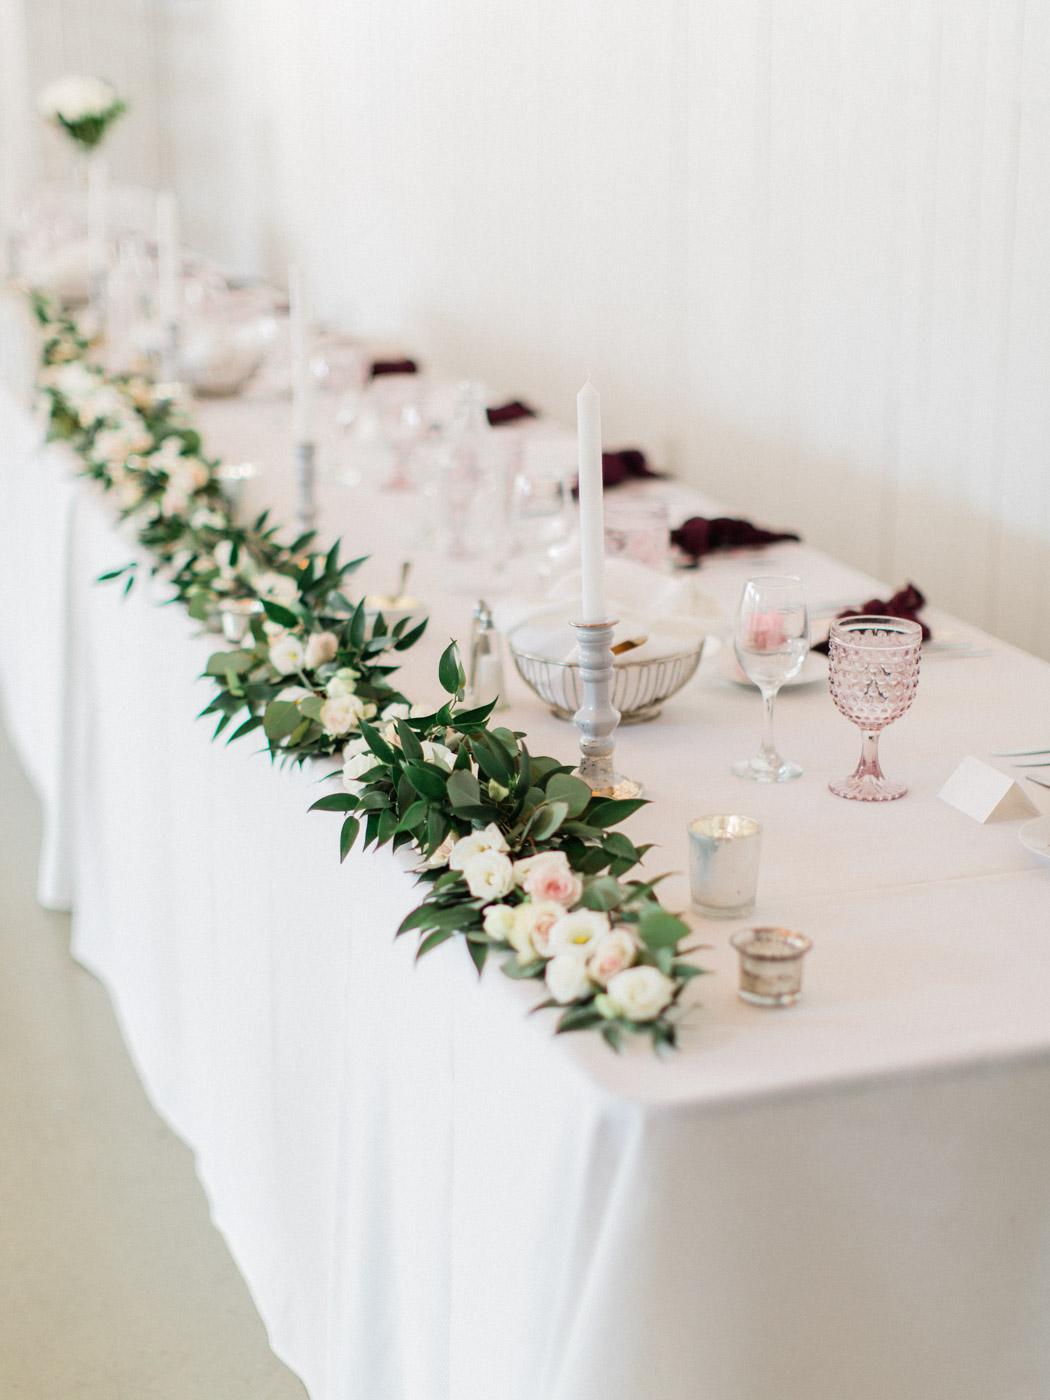 downtown-toronto-wedding-photographer-berkley-fieldhouse-blush-235.jpg